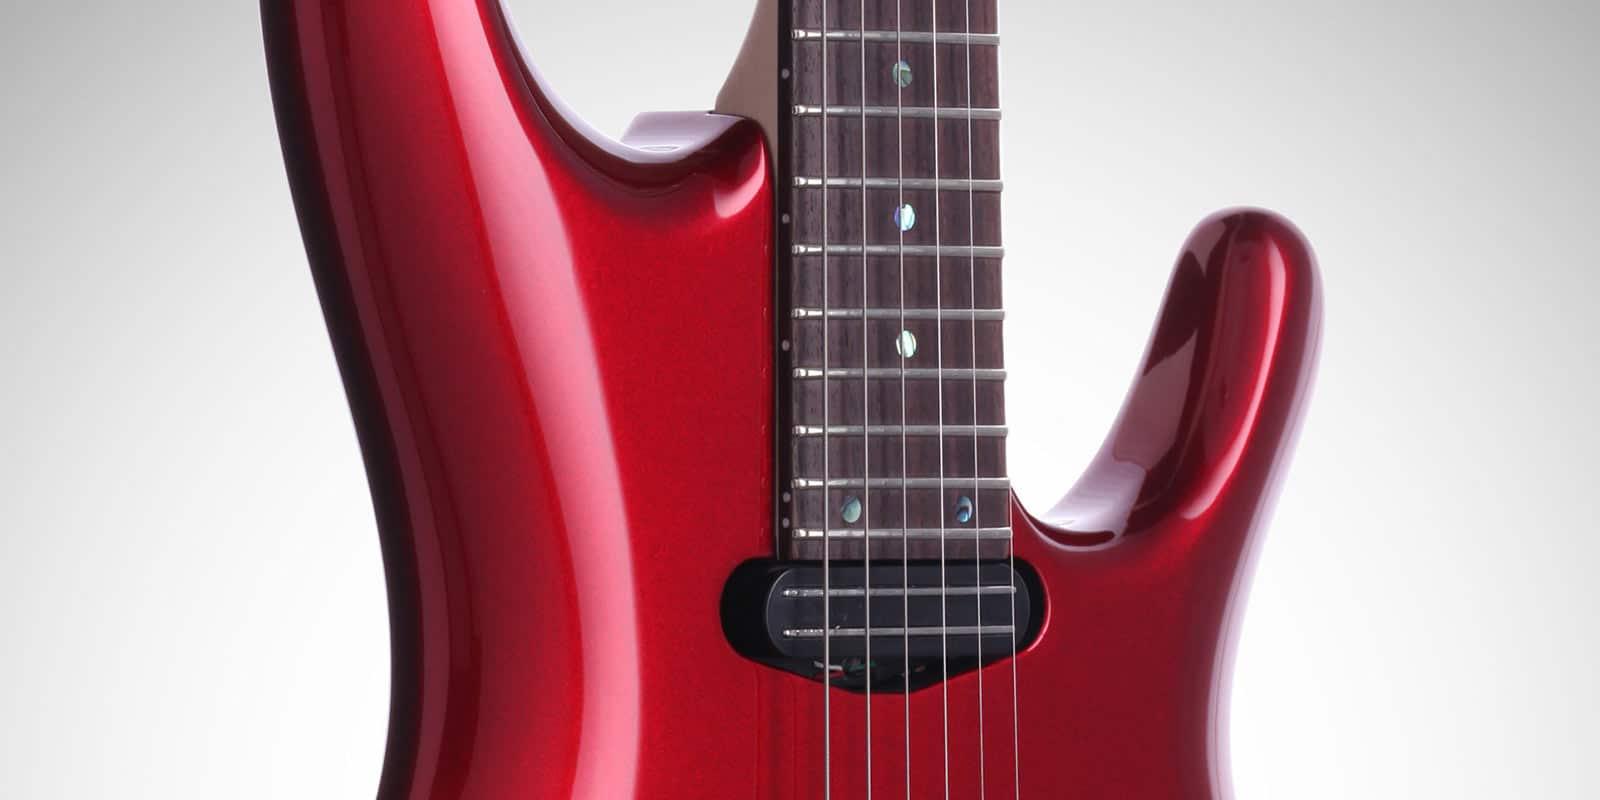 Ibanez JS Premium JS24P Joe Satriani signature